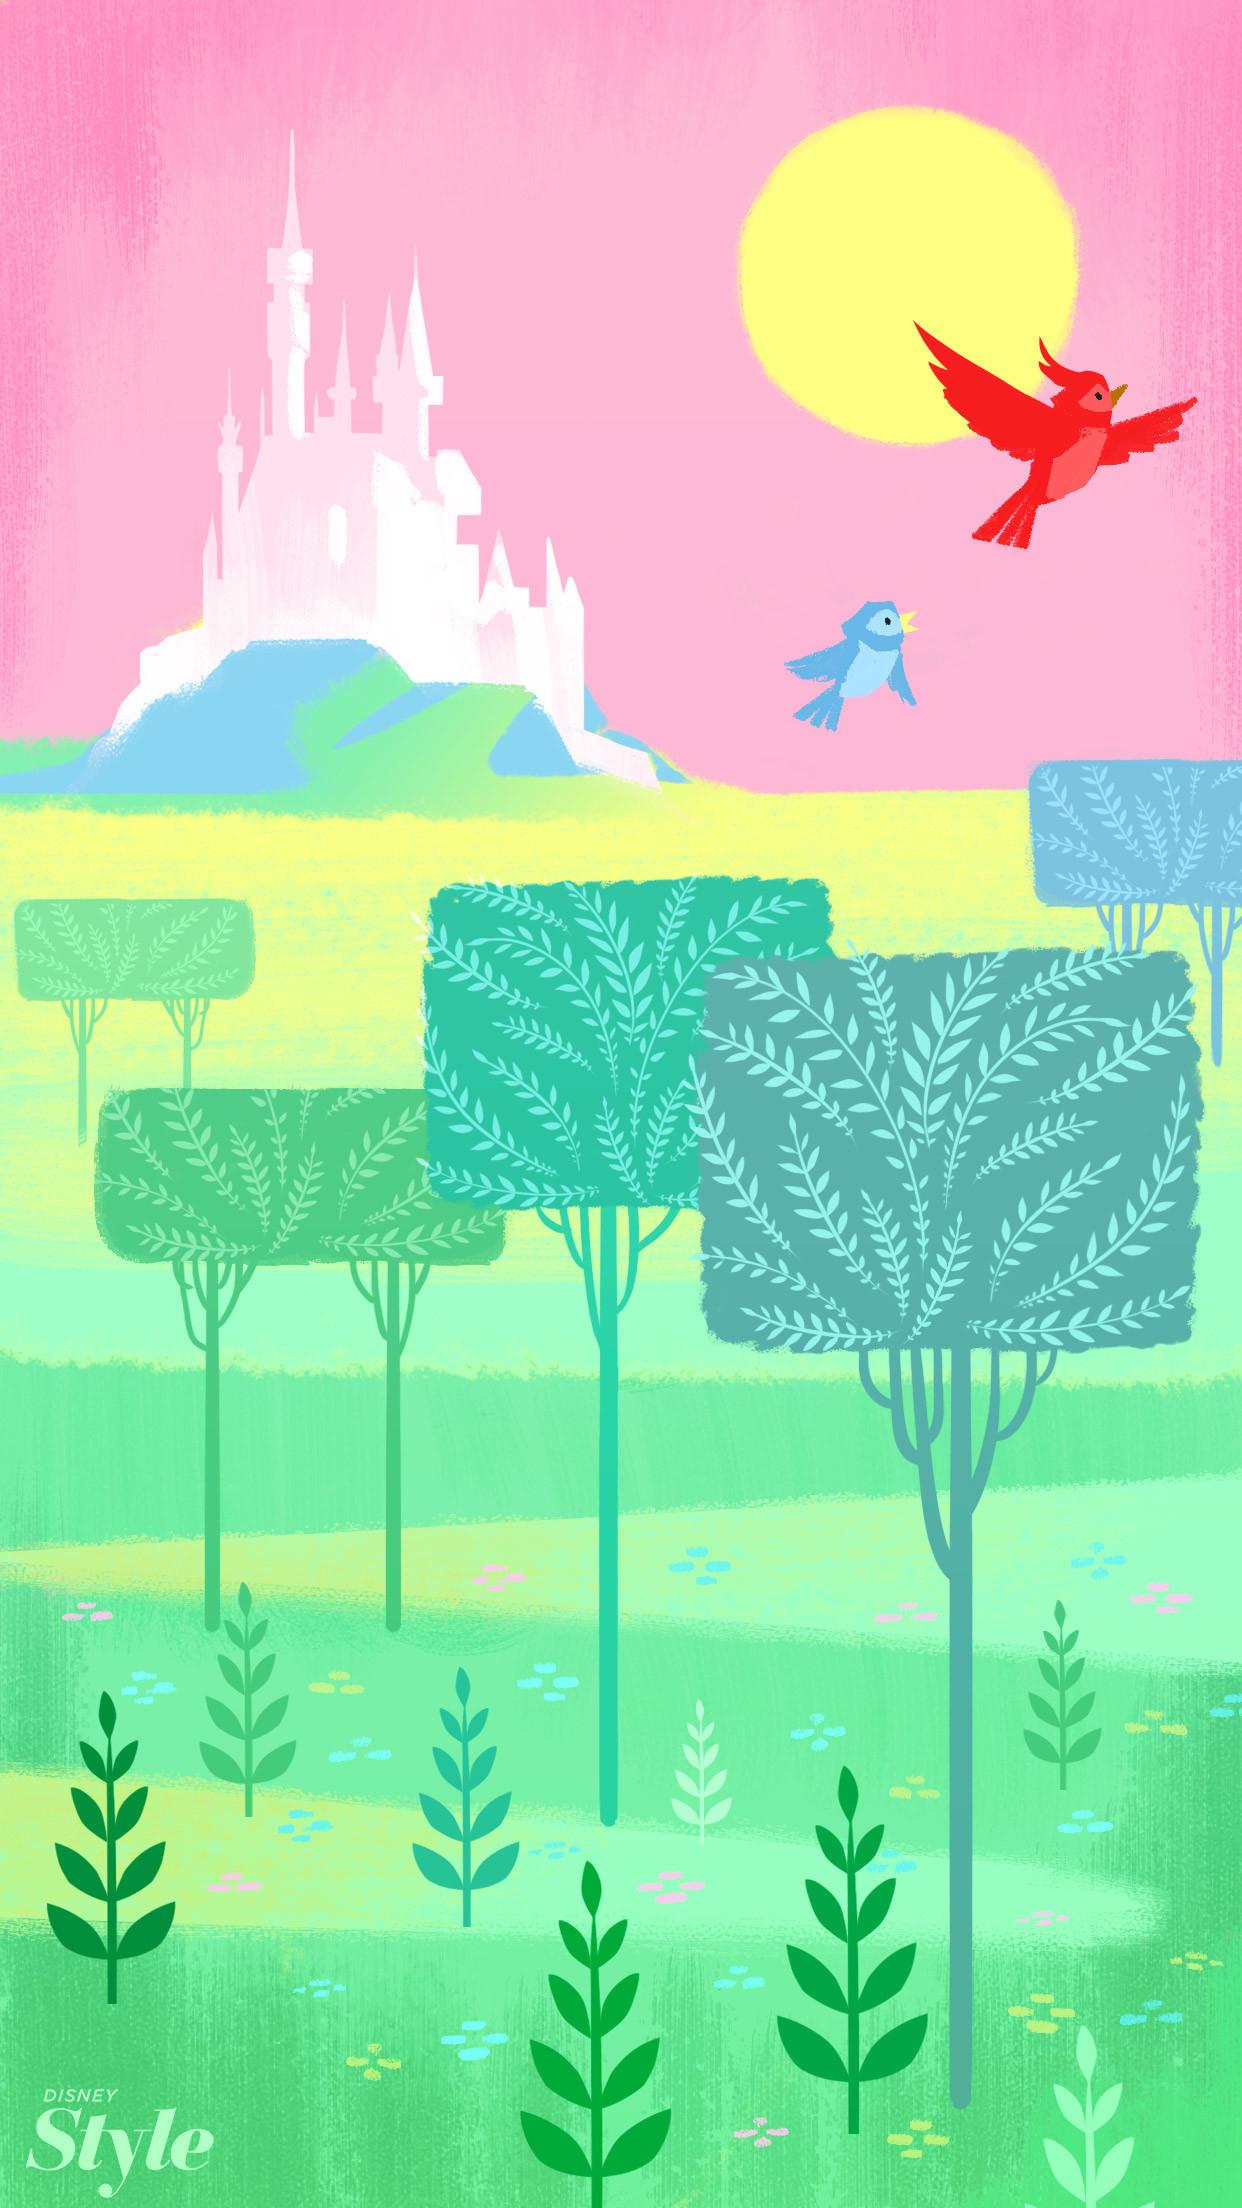 Disney style: Disney castle for iPhone wallpaper